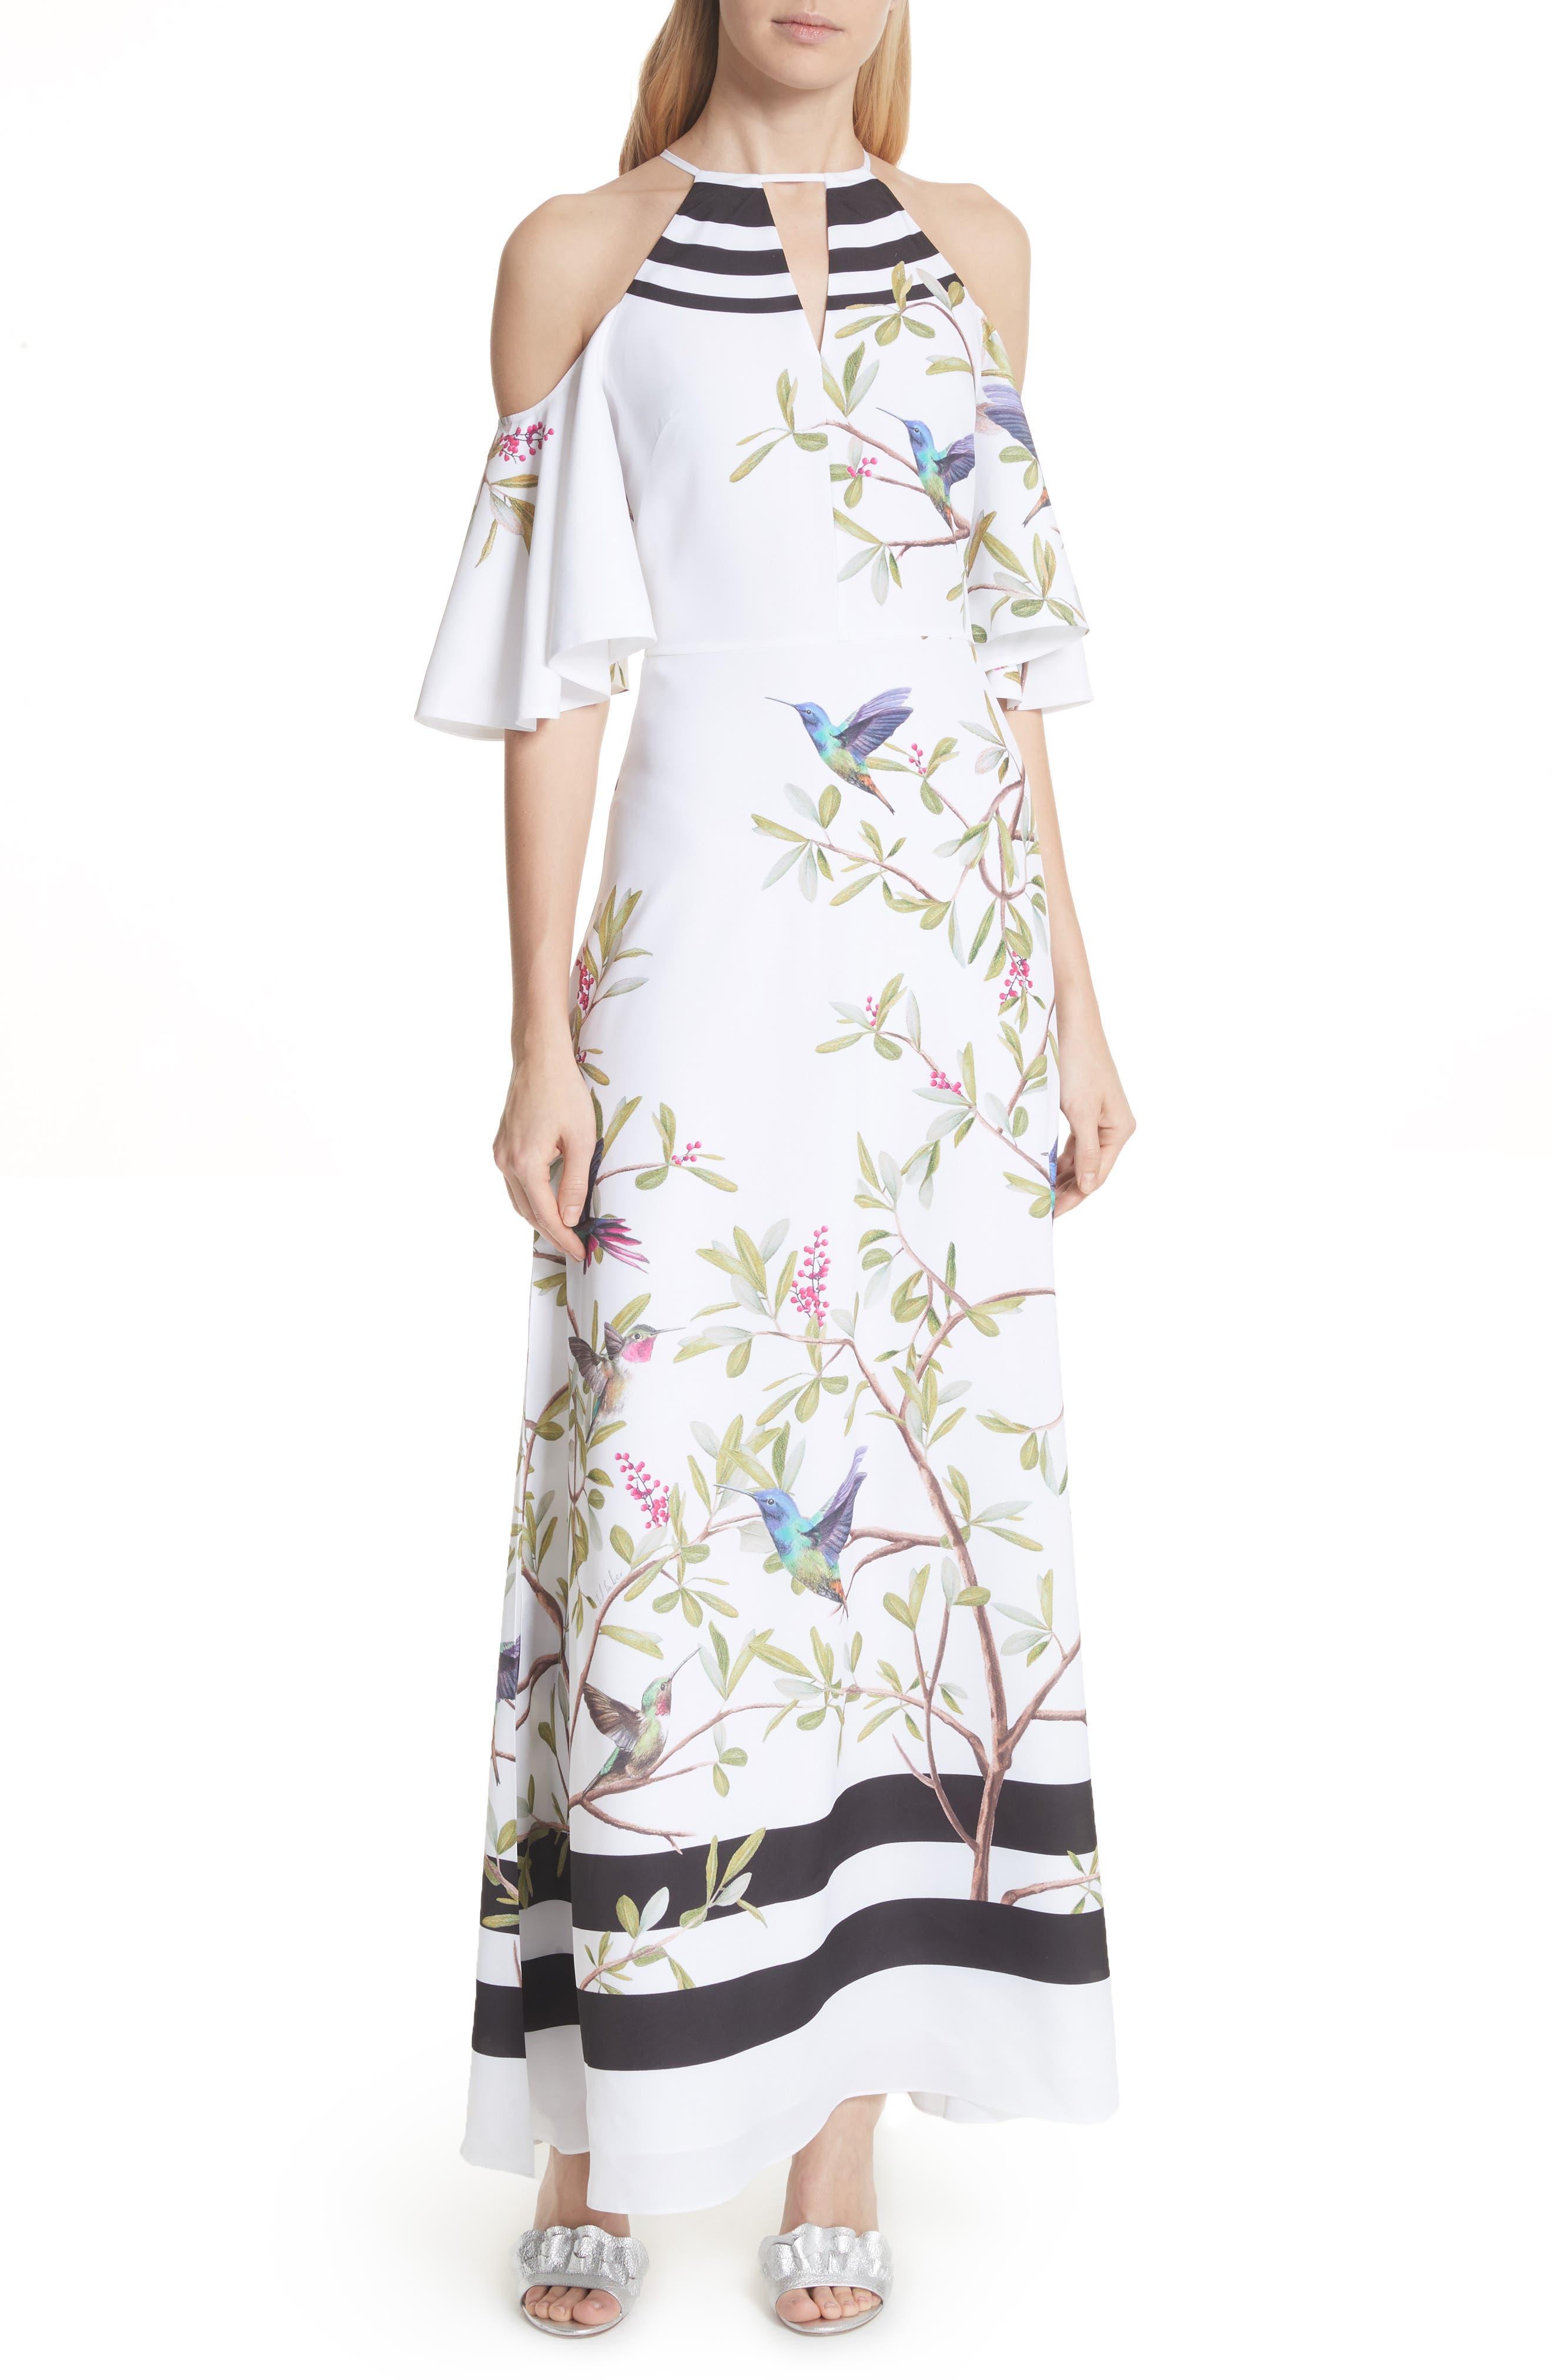 Highgrove Cold Shoulder Maxi Dress,                         Main,                         color, White